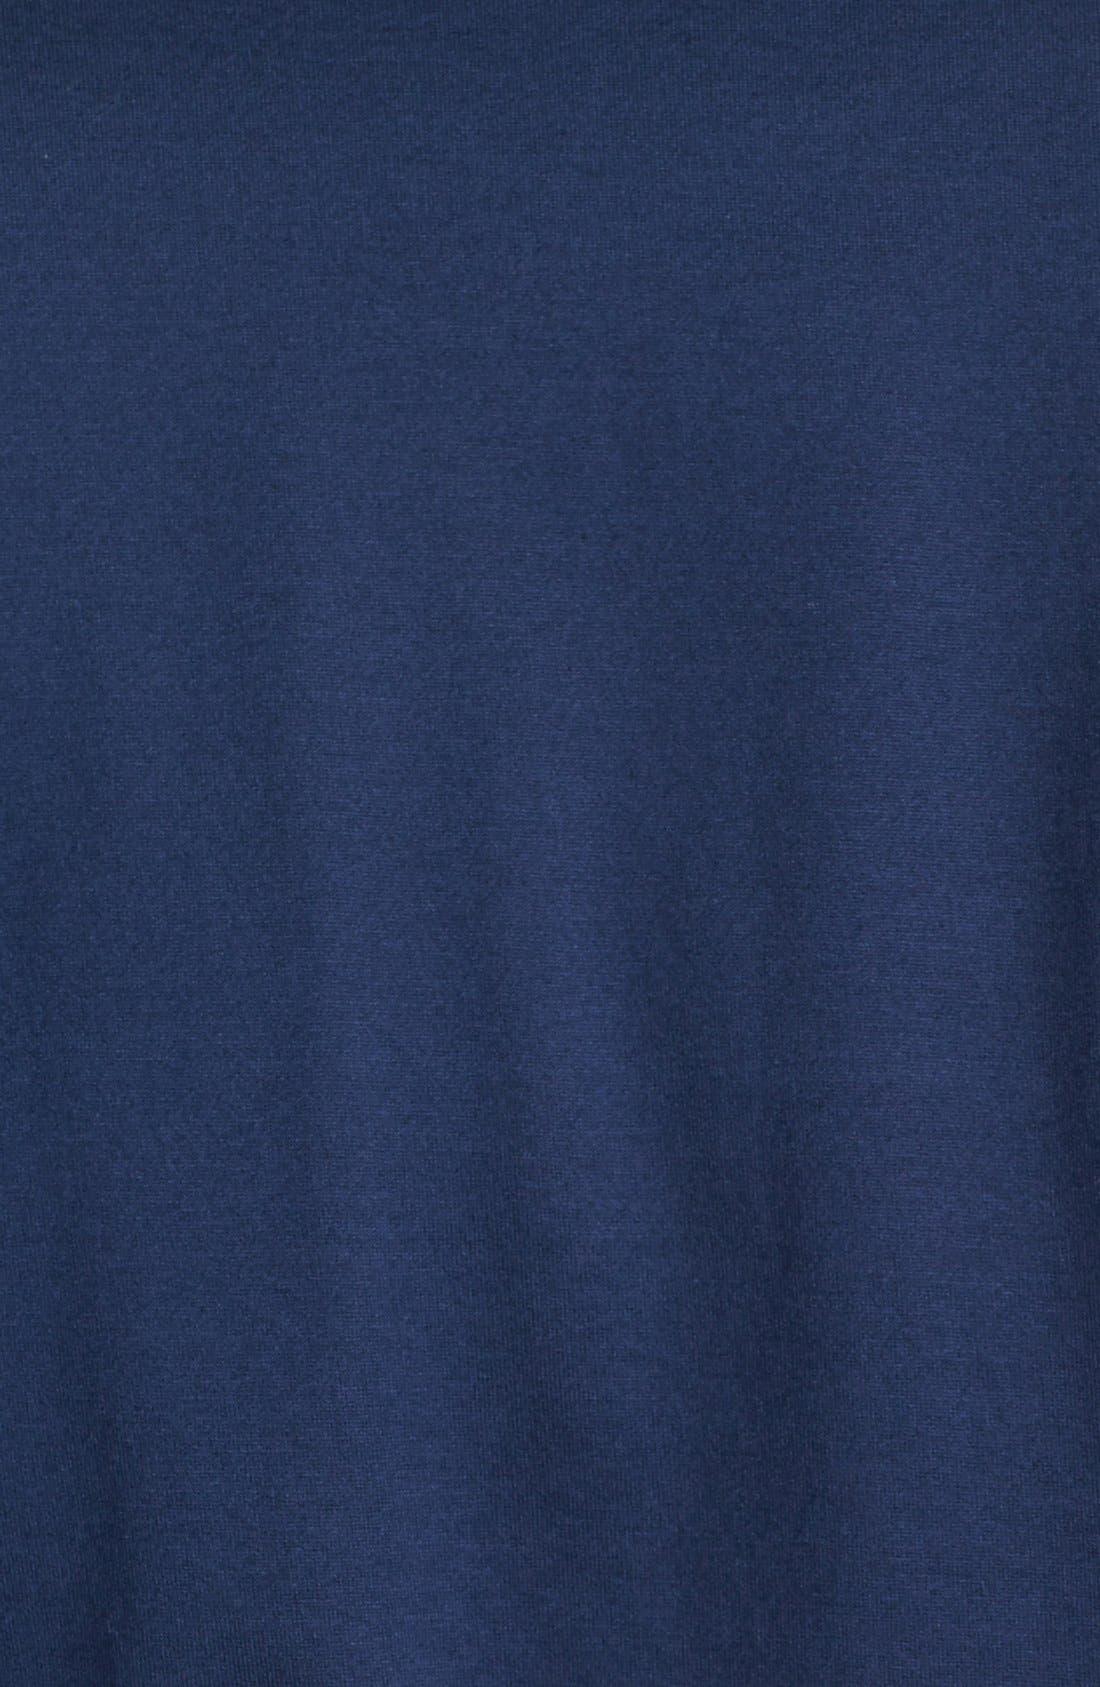 Alternate Image 3  - Peter Millar 'Auburn' Solid Polo